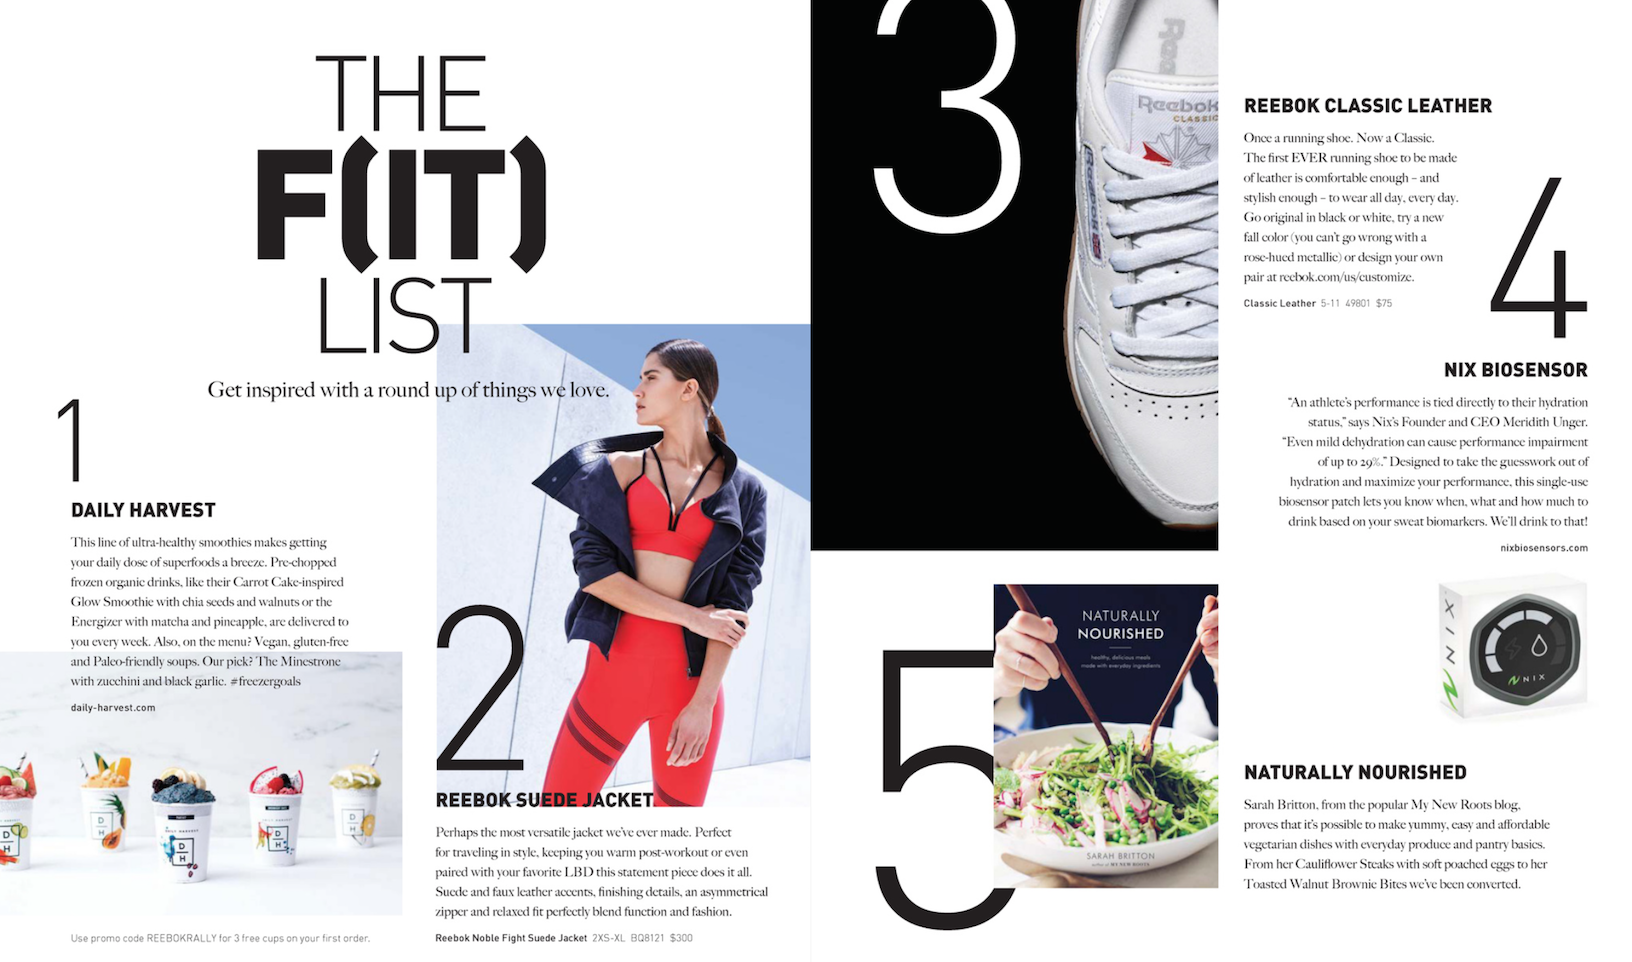 Reebok Fall '17 Catalog - Lifestyle Marketing